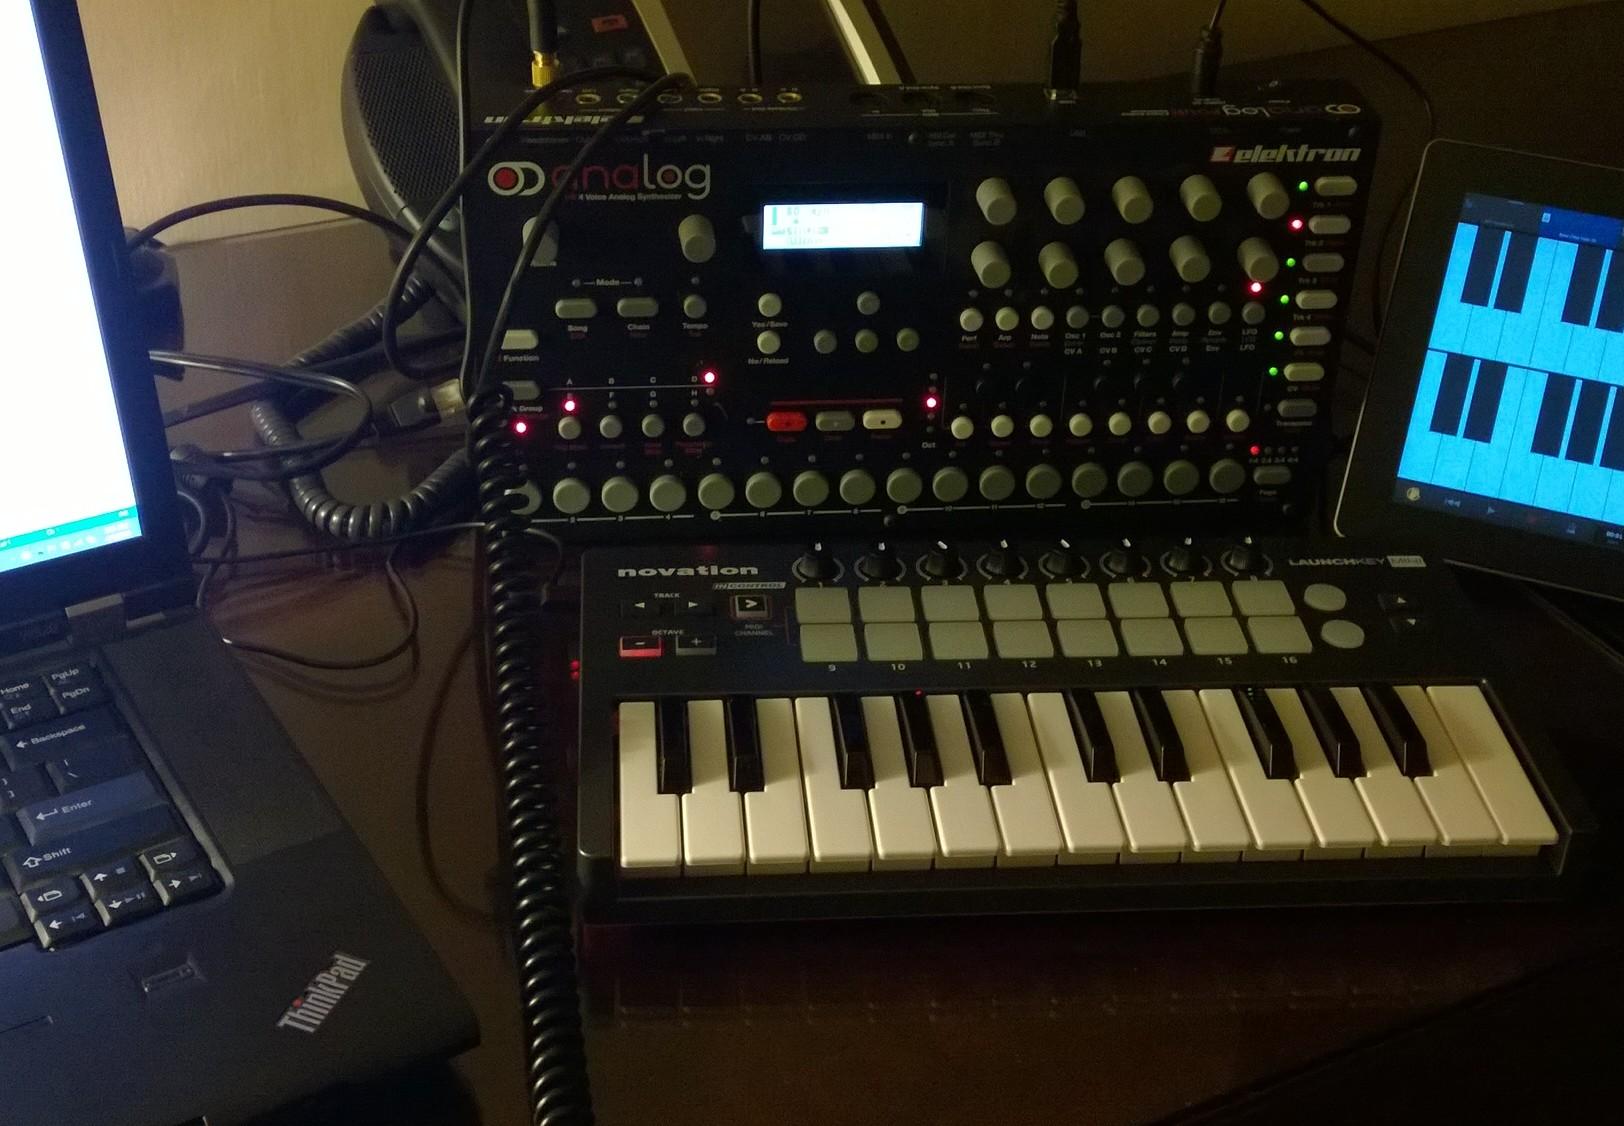 file elektron analog four novation launchkey mini ipad my setup for my synthesizers midi. Black Bedroom Furniture Sets. Home Design Ideas